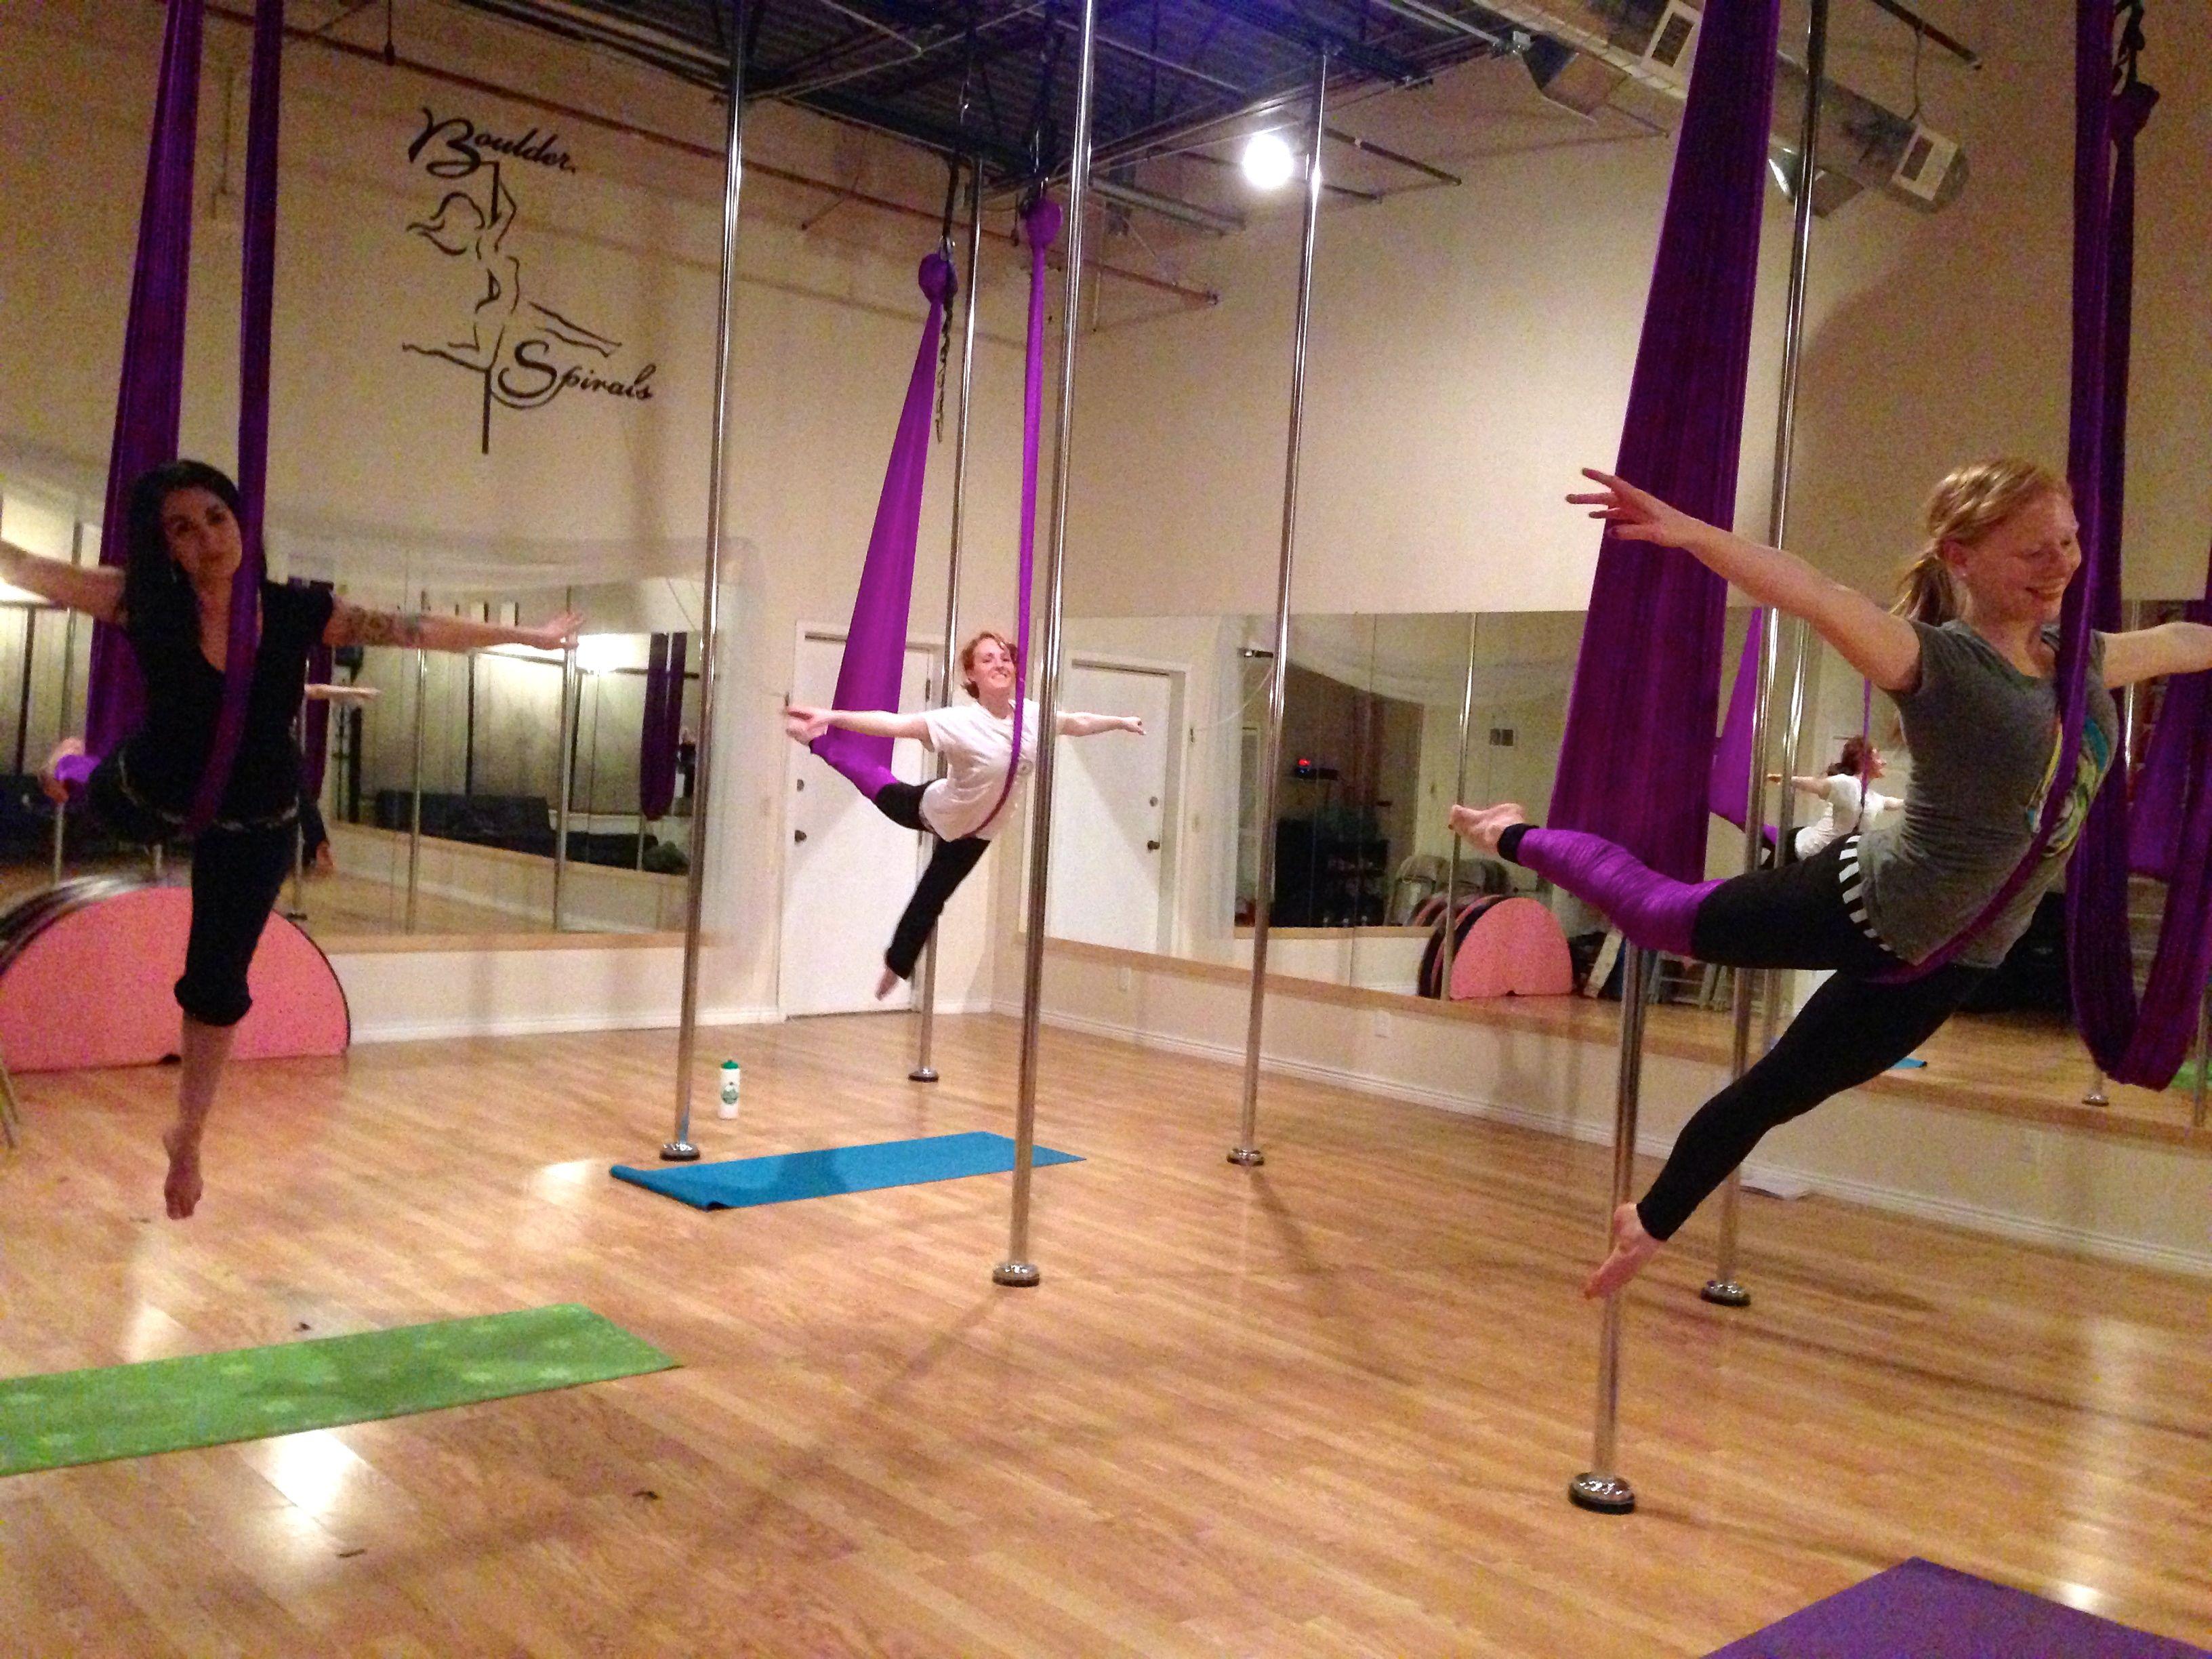 Fun in Aerial Yoga at Boulder Spirals Aerial yoga, Air